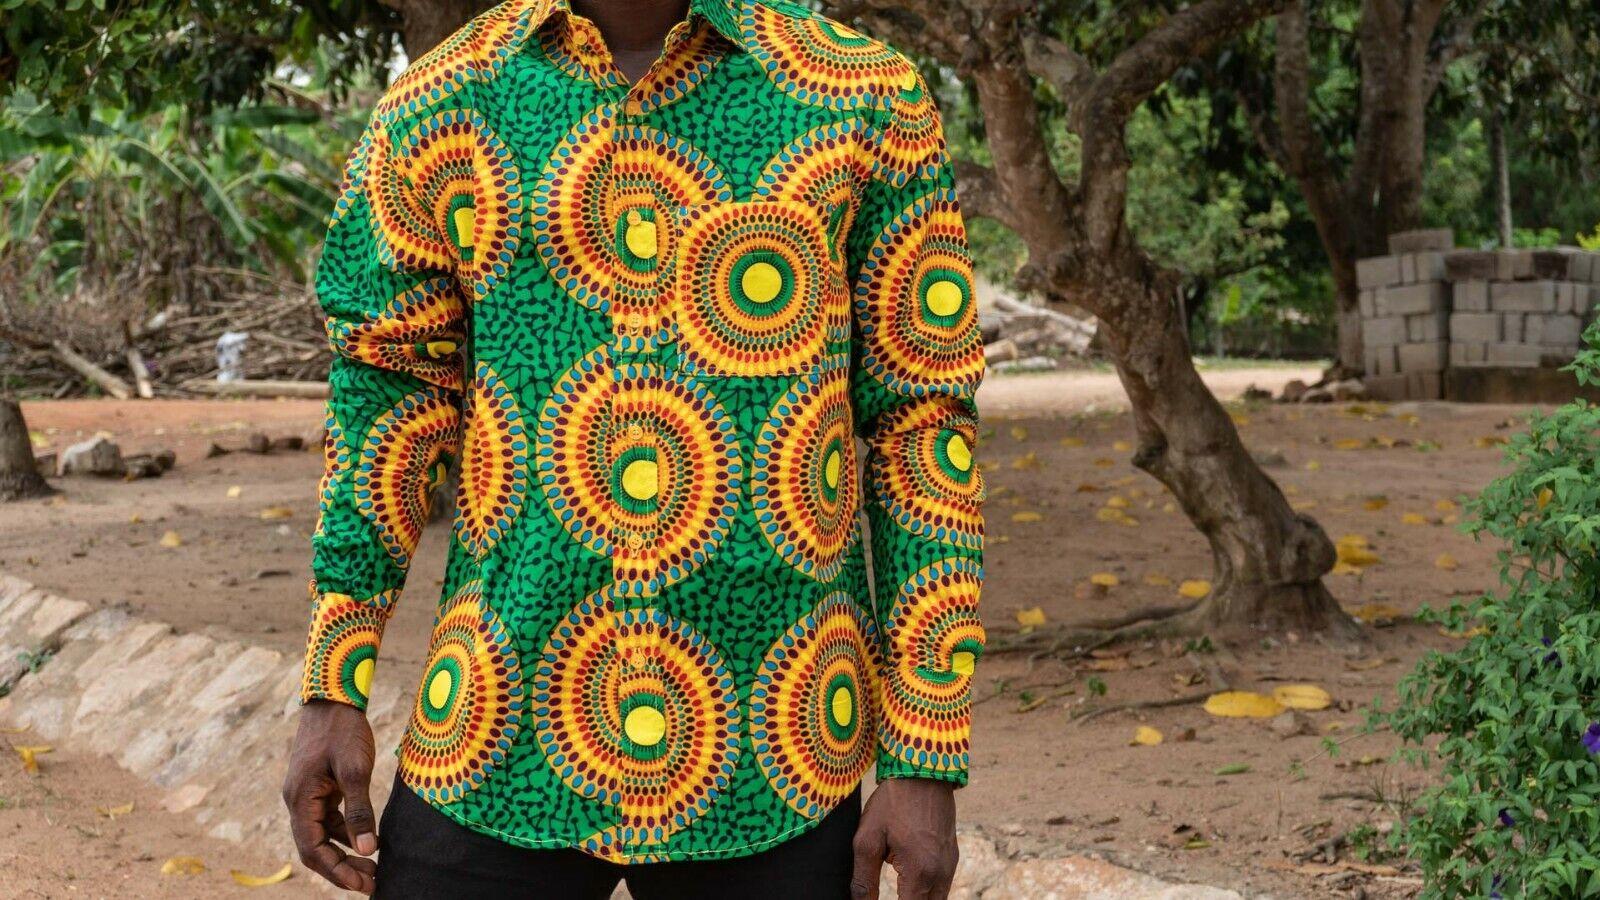 Afrikanisches Hemd - 100% Baumwolle - - - Made in Ghana - Grün Gelb | Quality First  | Moderate Kosten  | Großer Verkauf  d21ca0